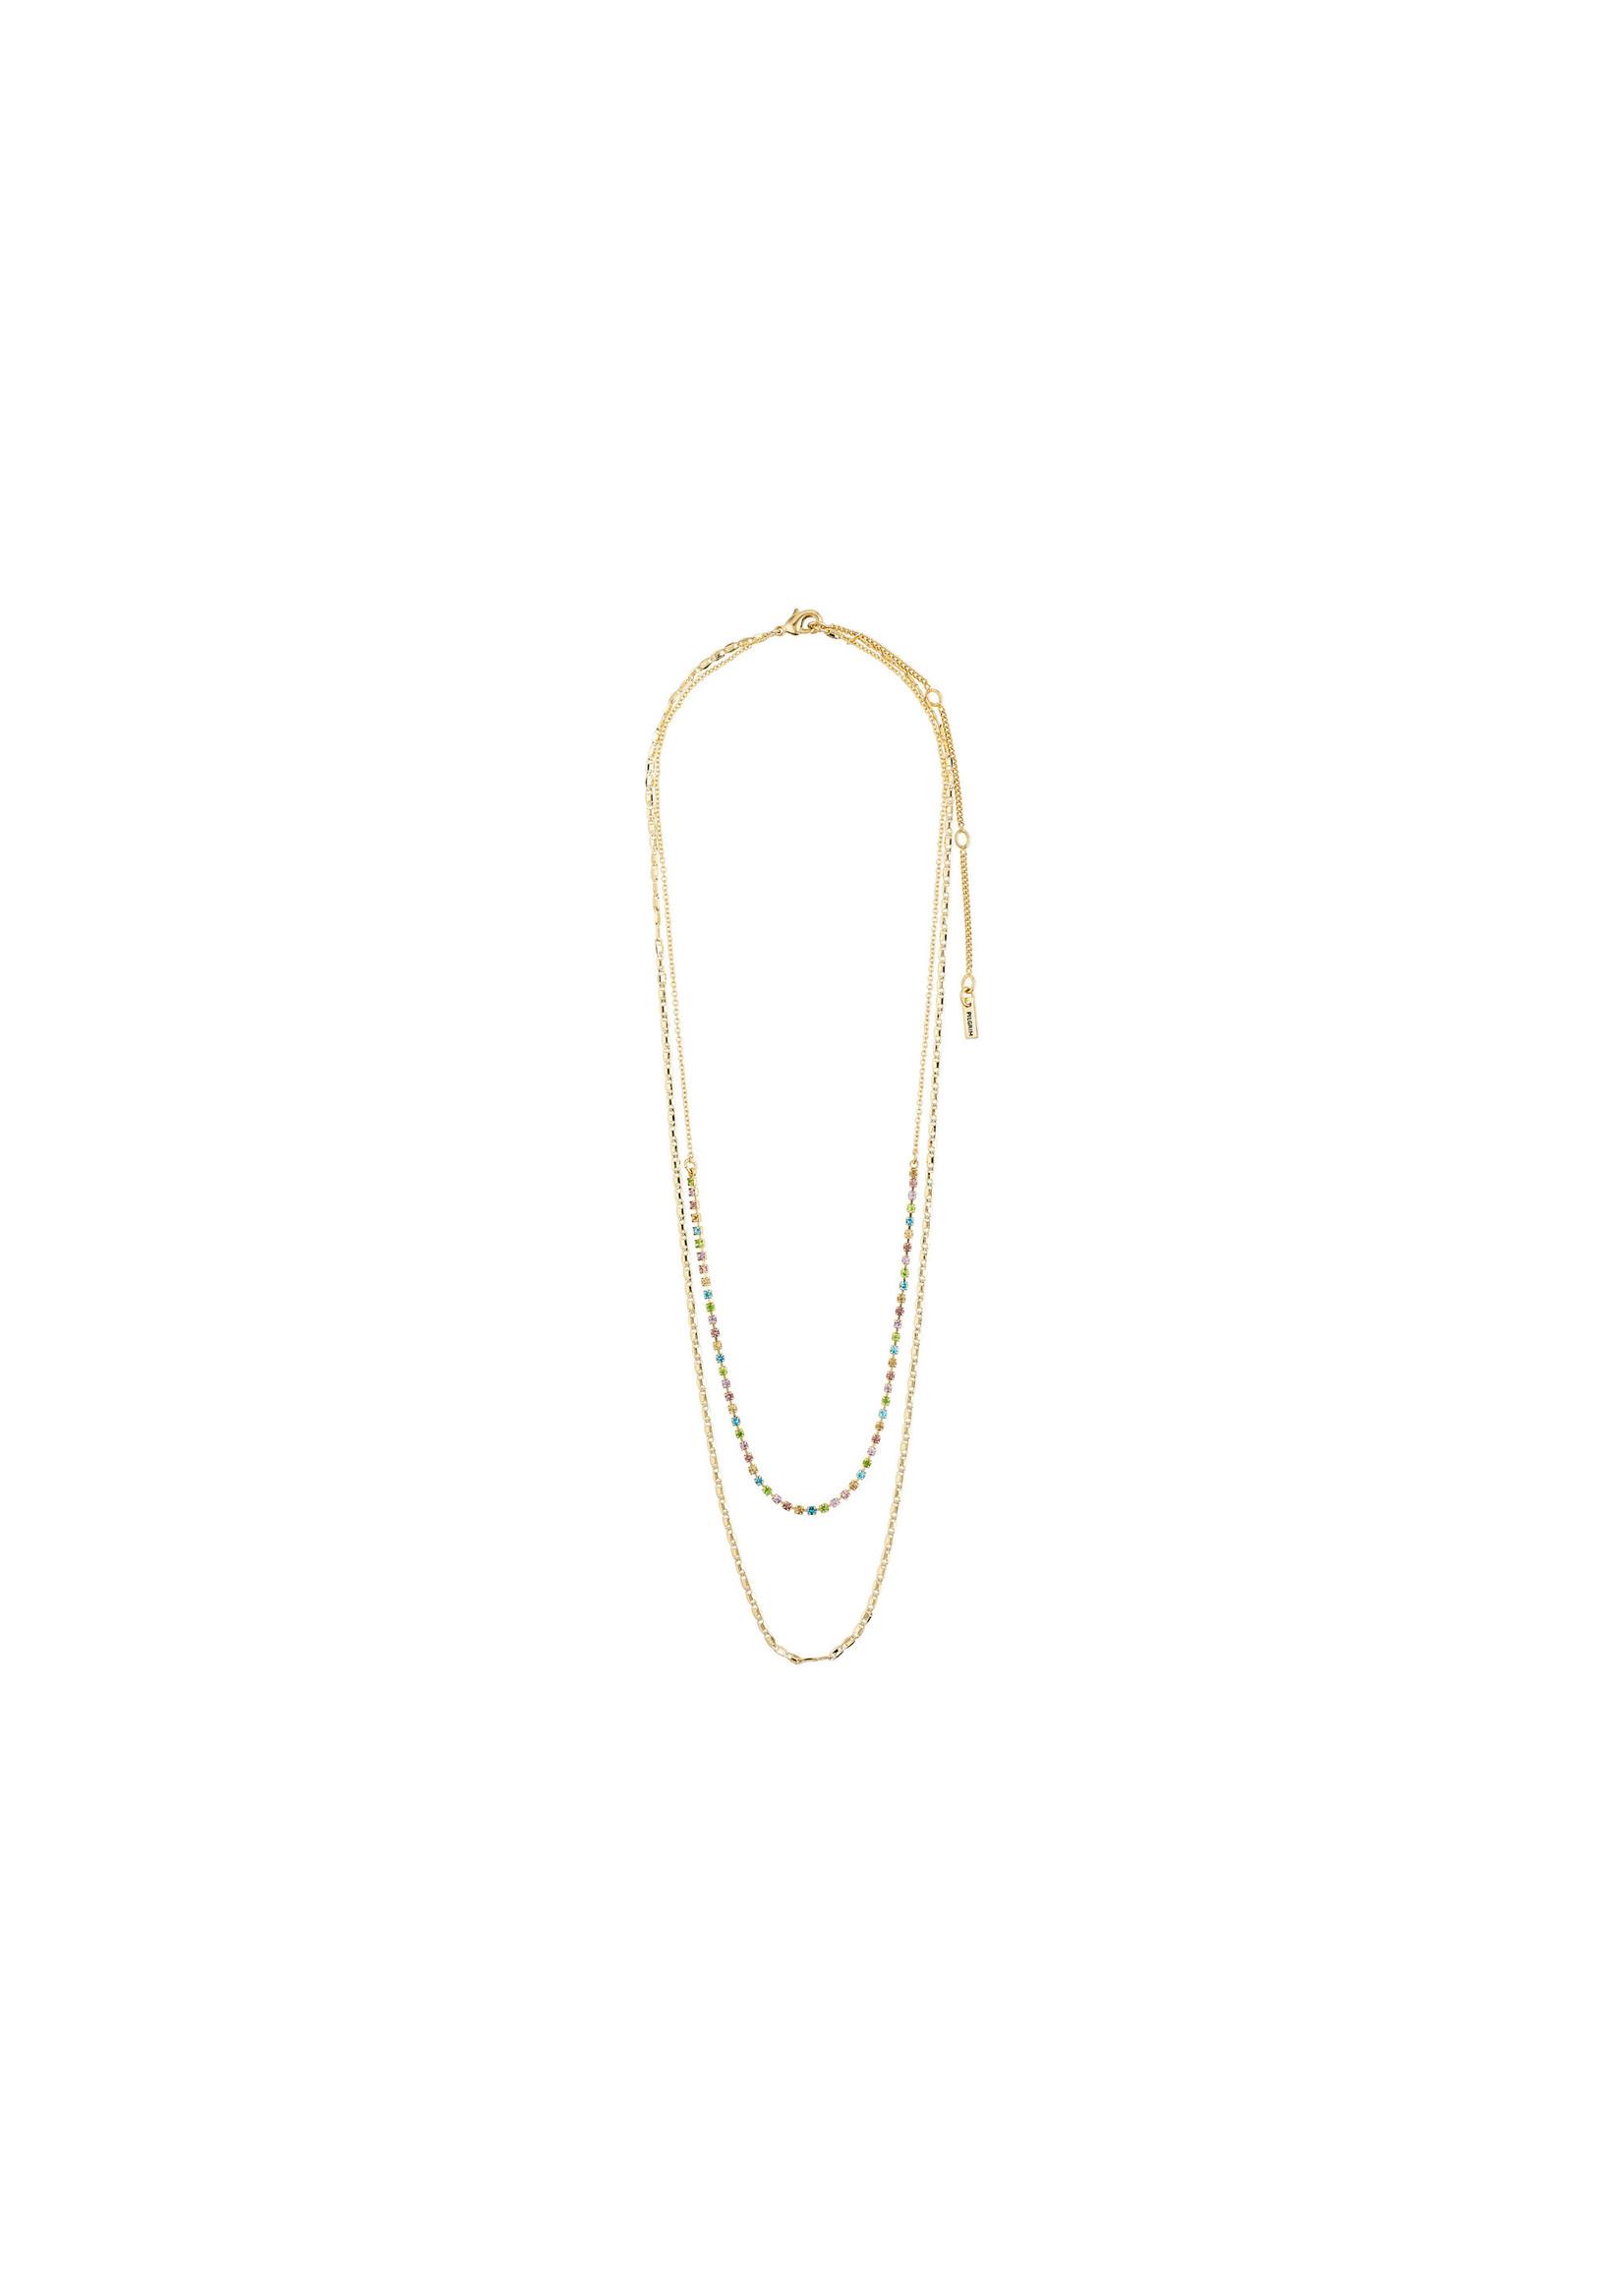 Cherished Layered Necklace - Gold